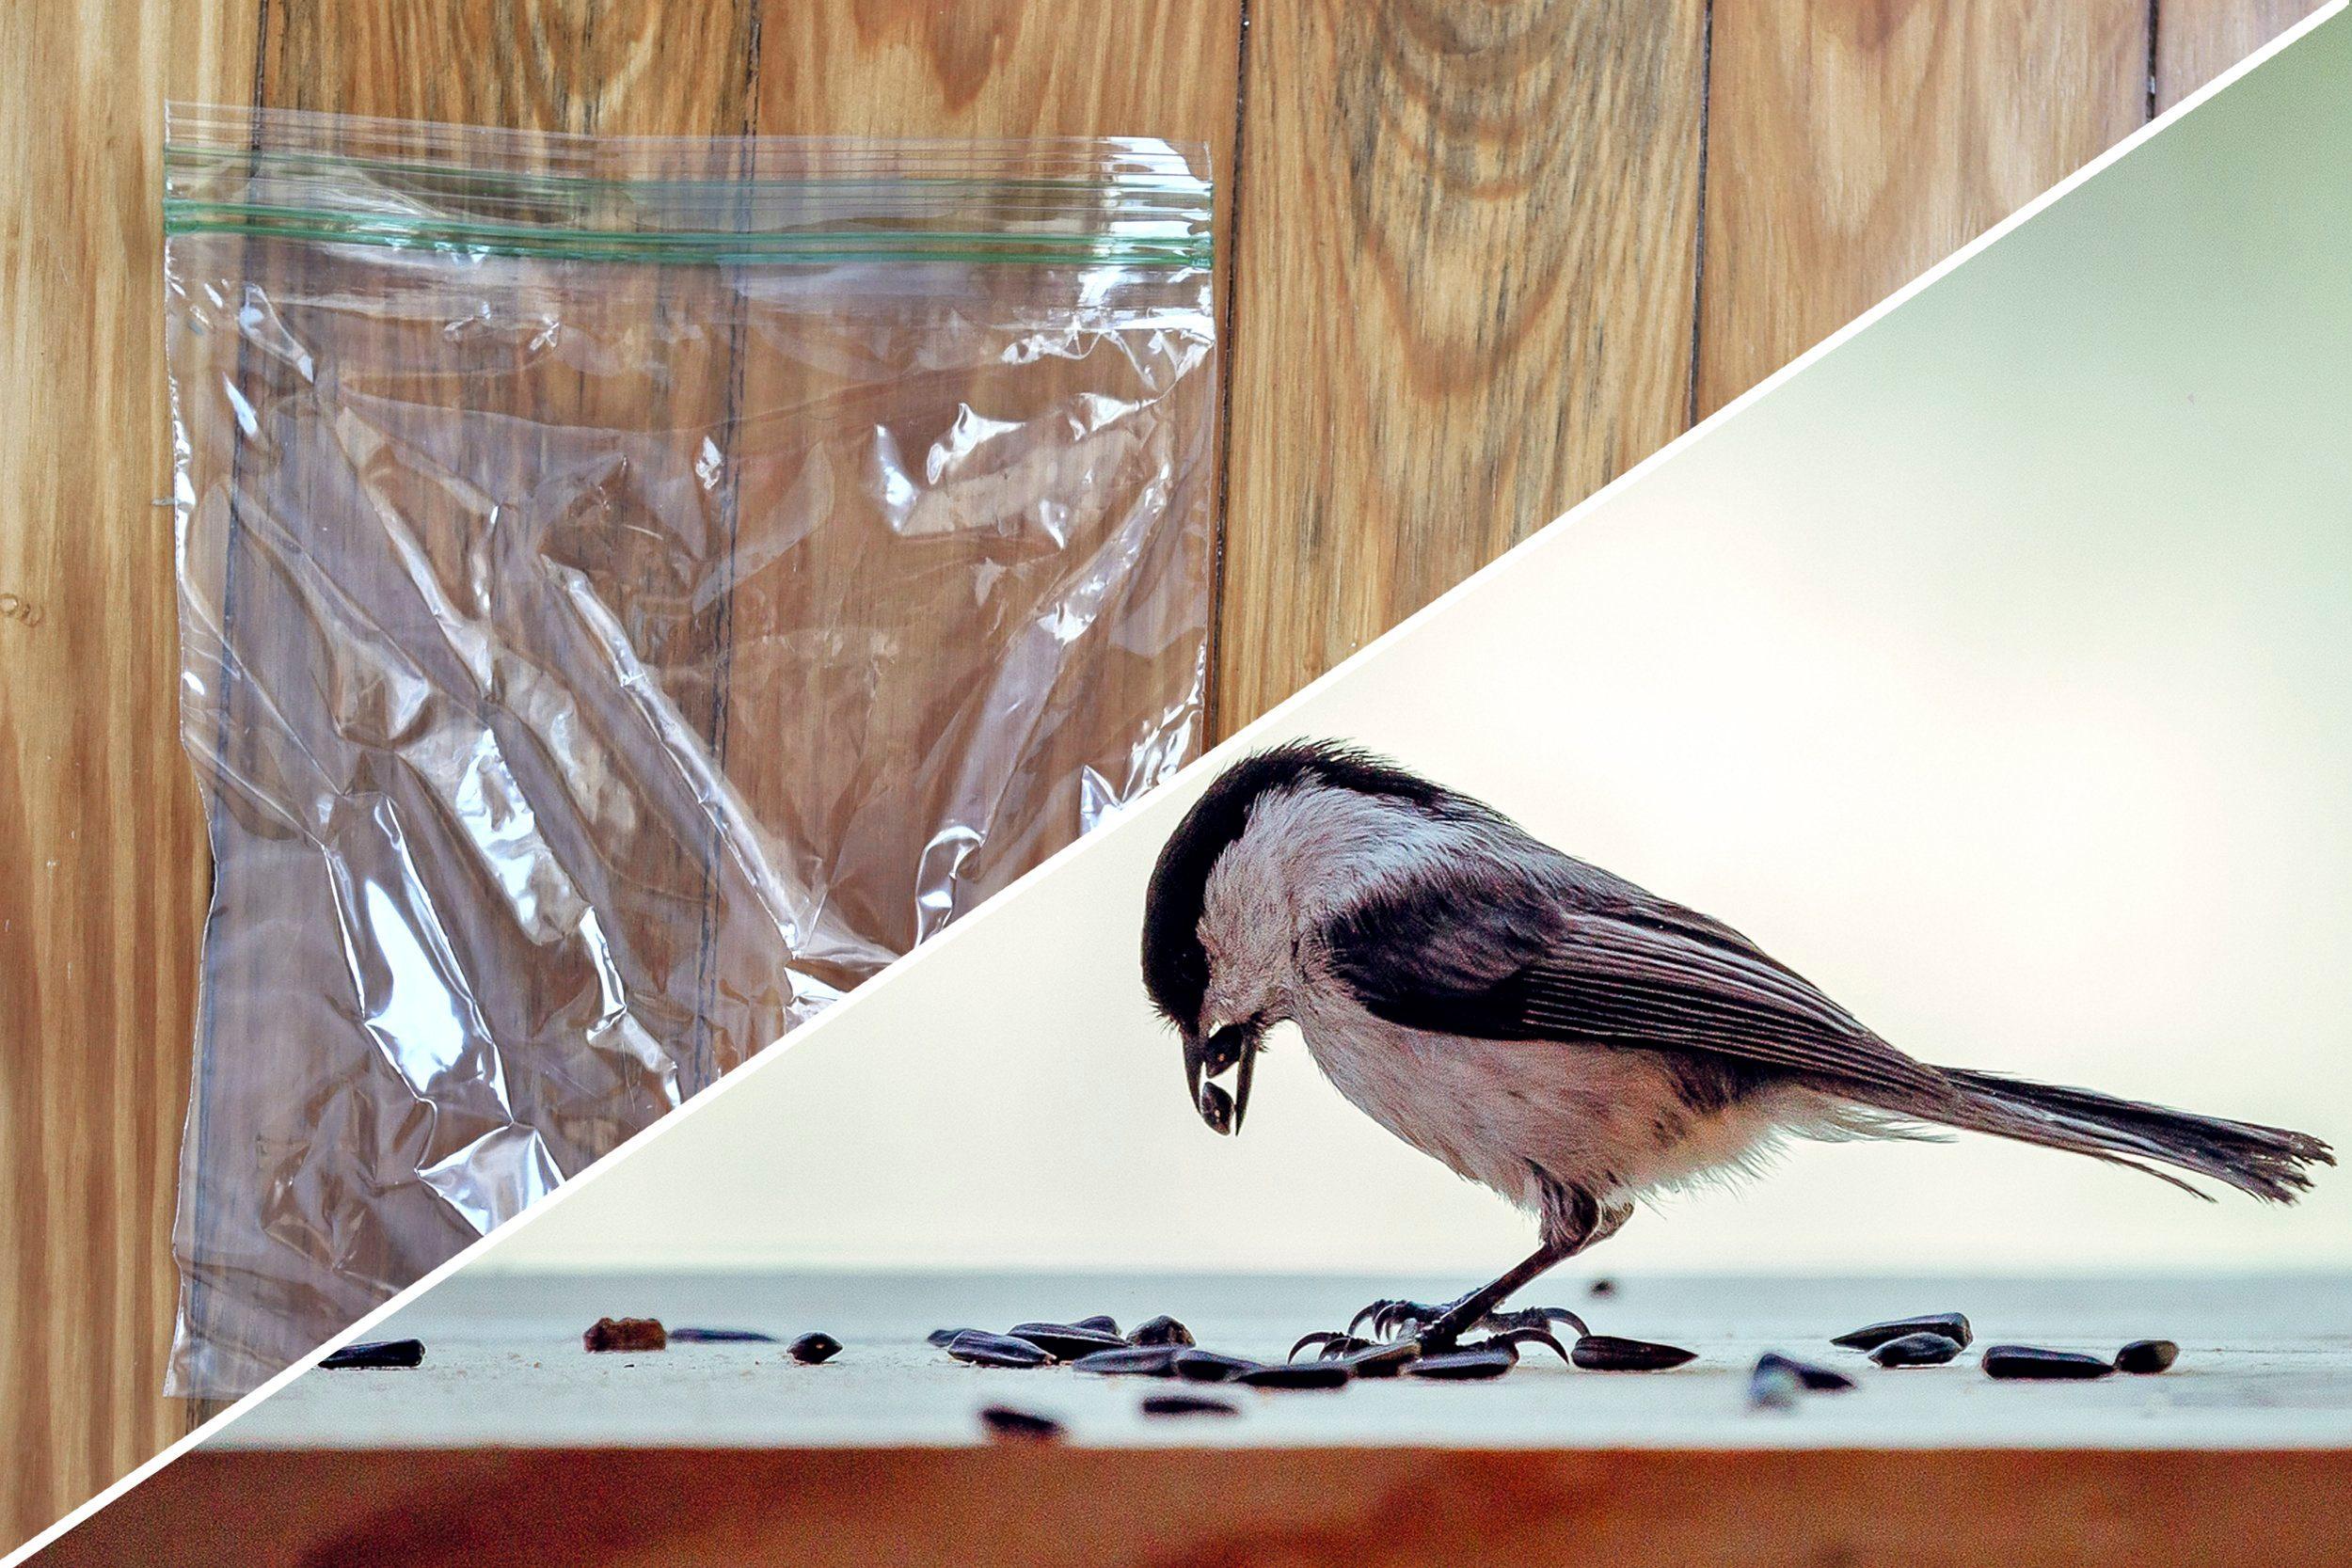 bird seed plastic bag uses